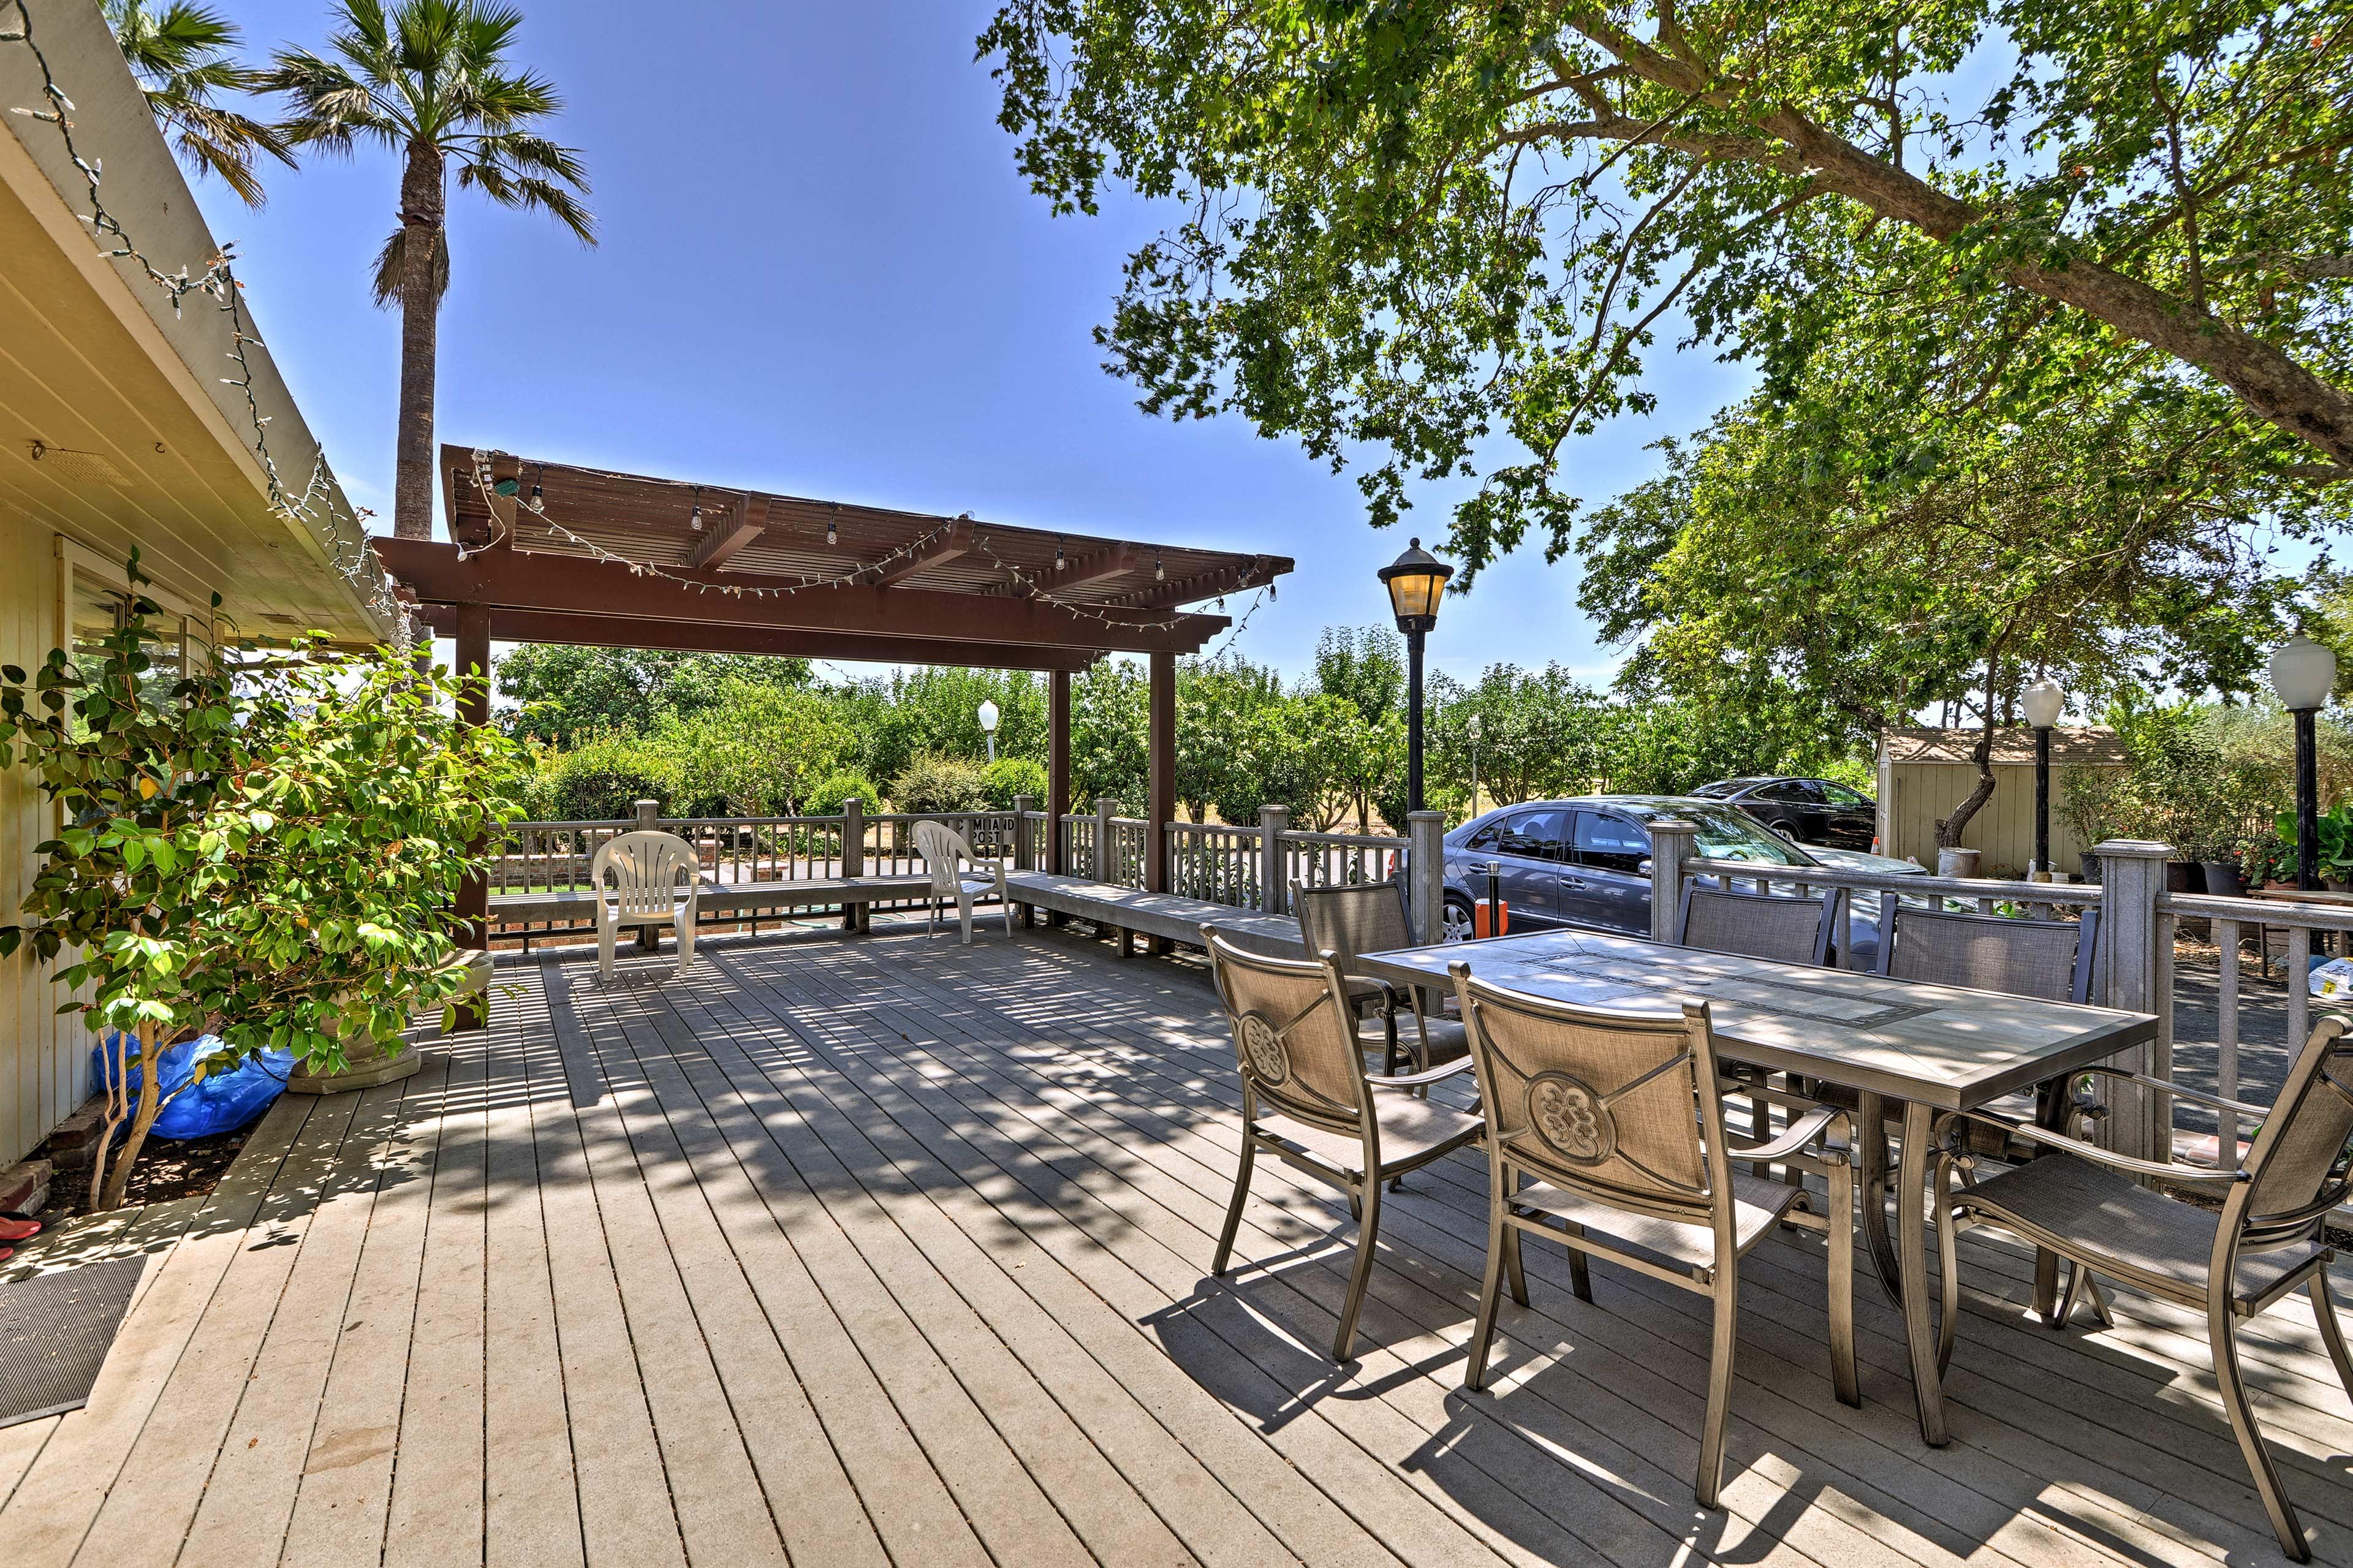 Dine al fresco around the 6-person outdoor table.